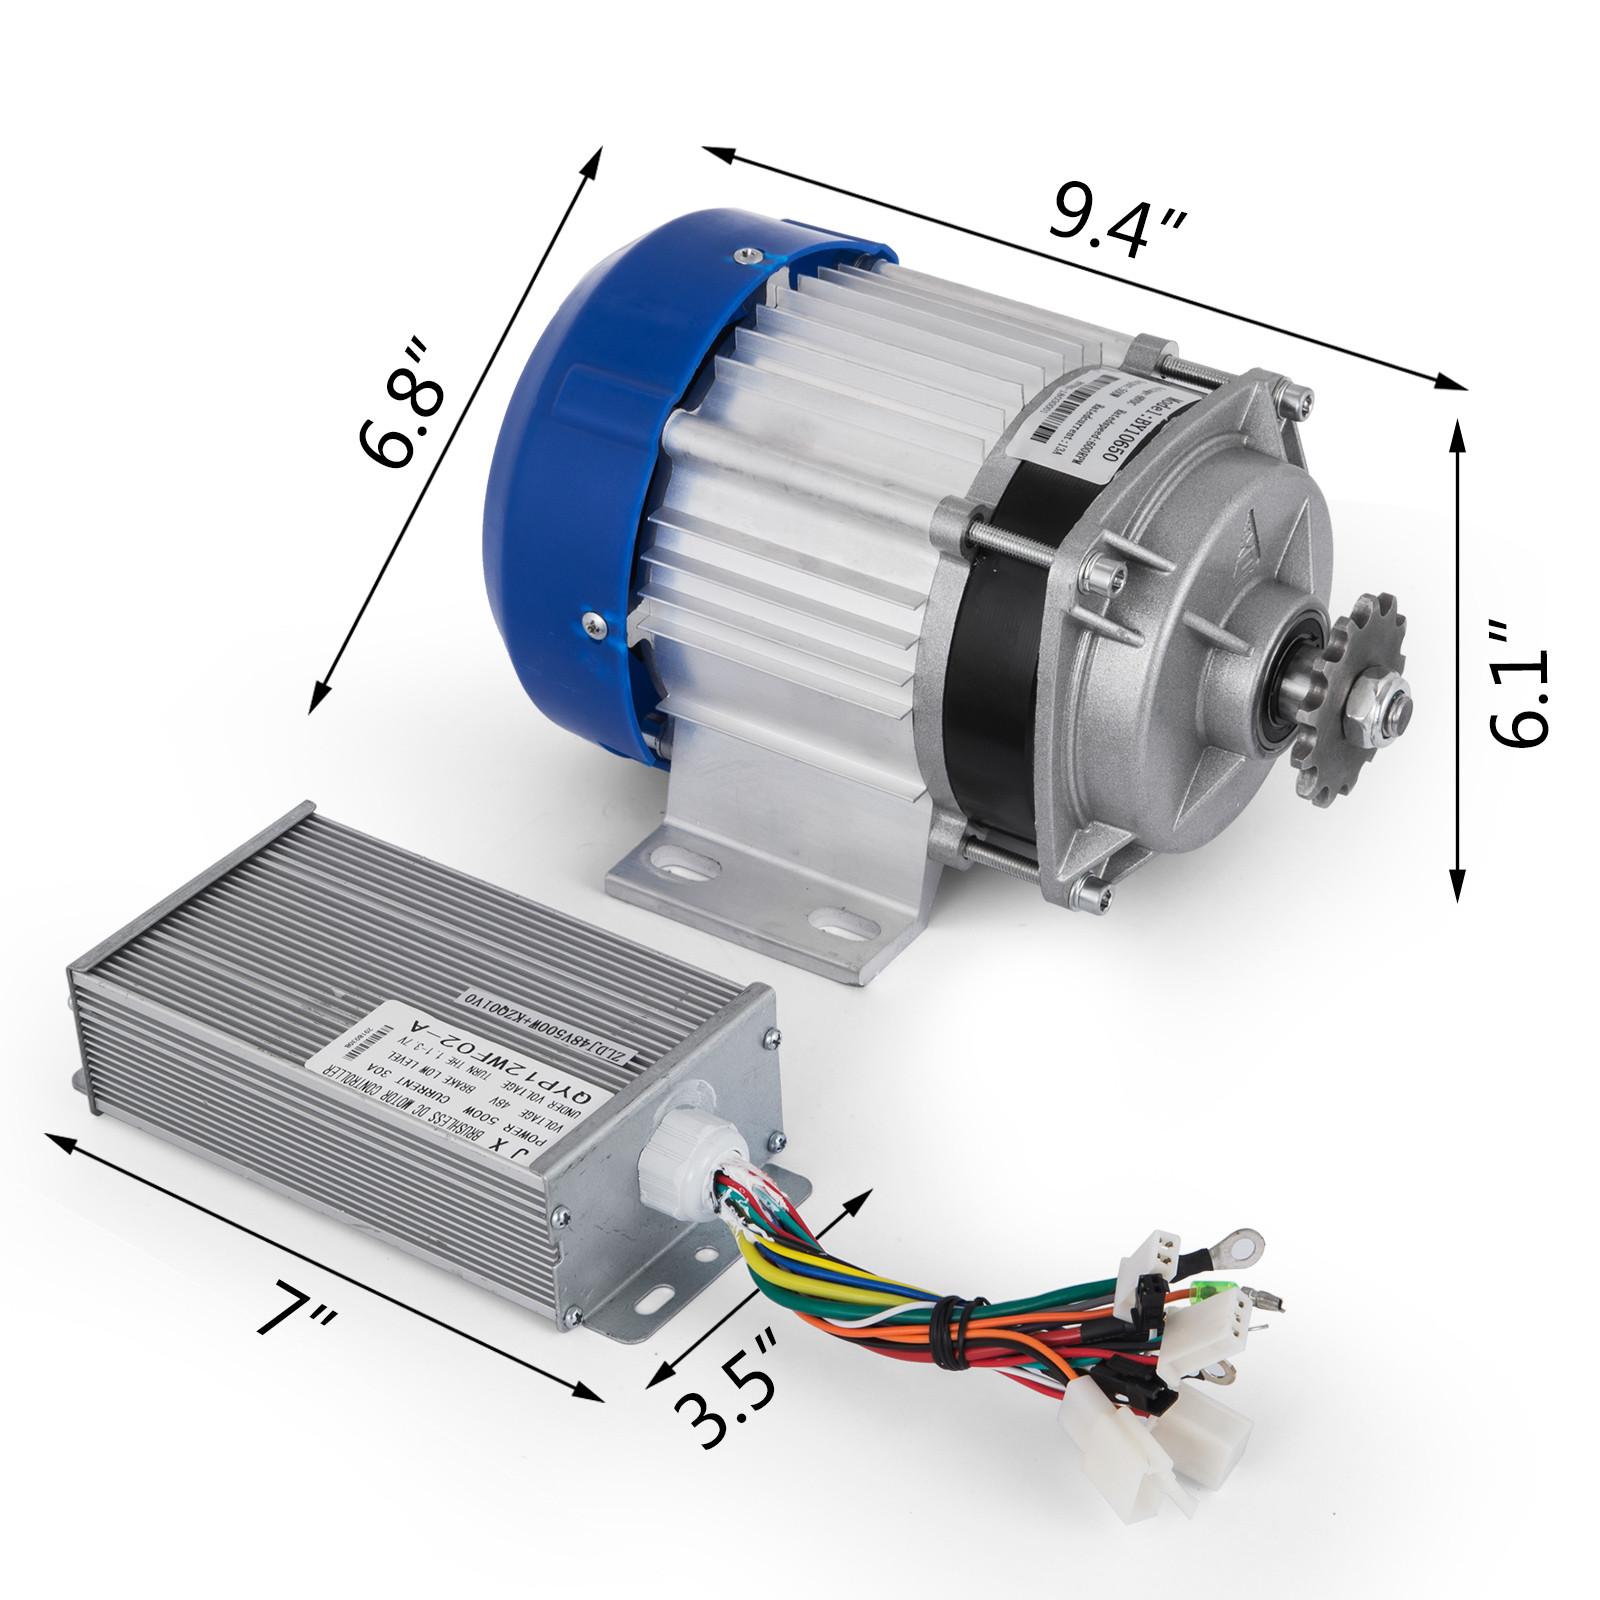 1800W-48V-DC-Brushless-Electric-Motor-Kit-f-Scooter-500-1800W-E-Bike-Go-Kart thumbnail 134